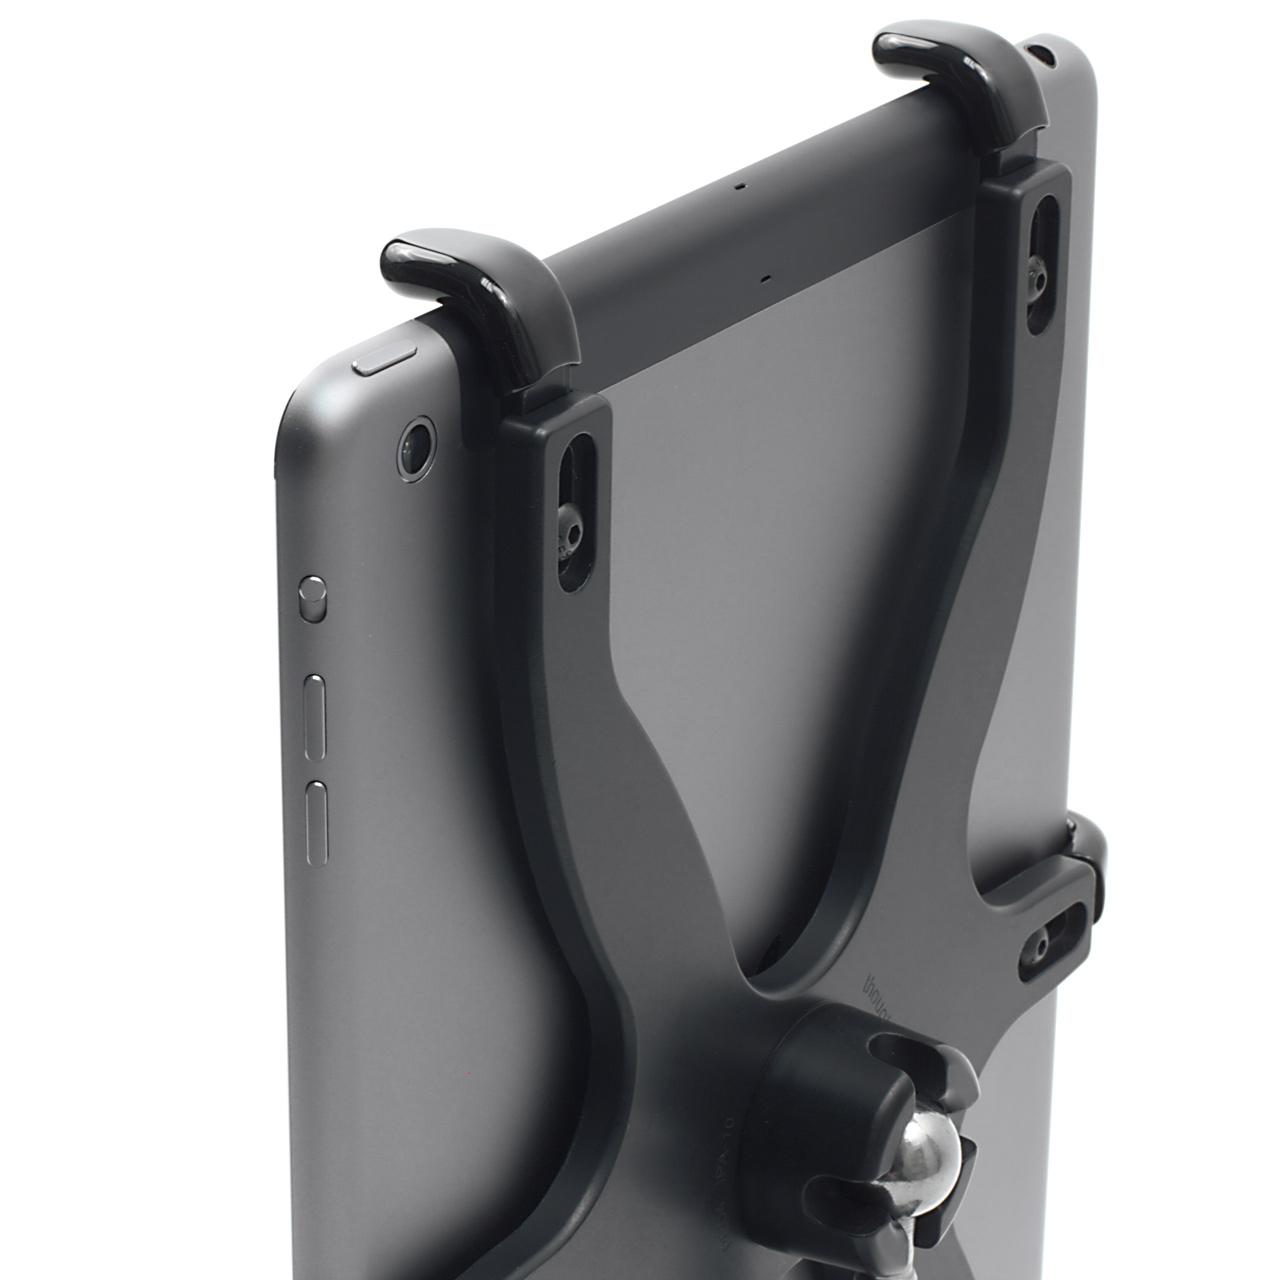 PED4 IPA10 iPad Pivoting Tripod Mount